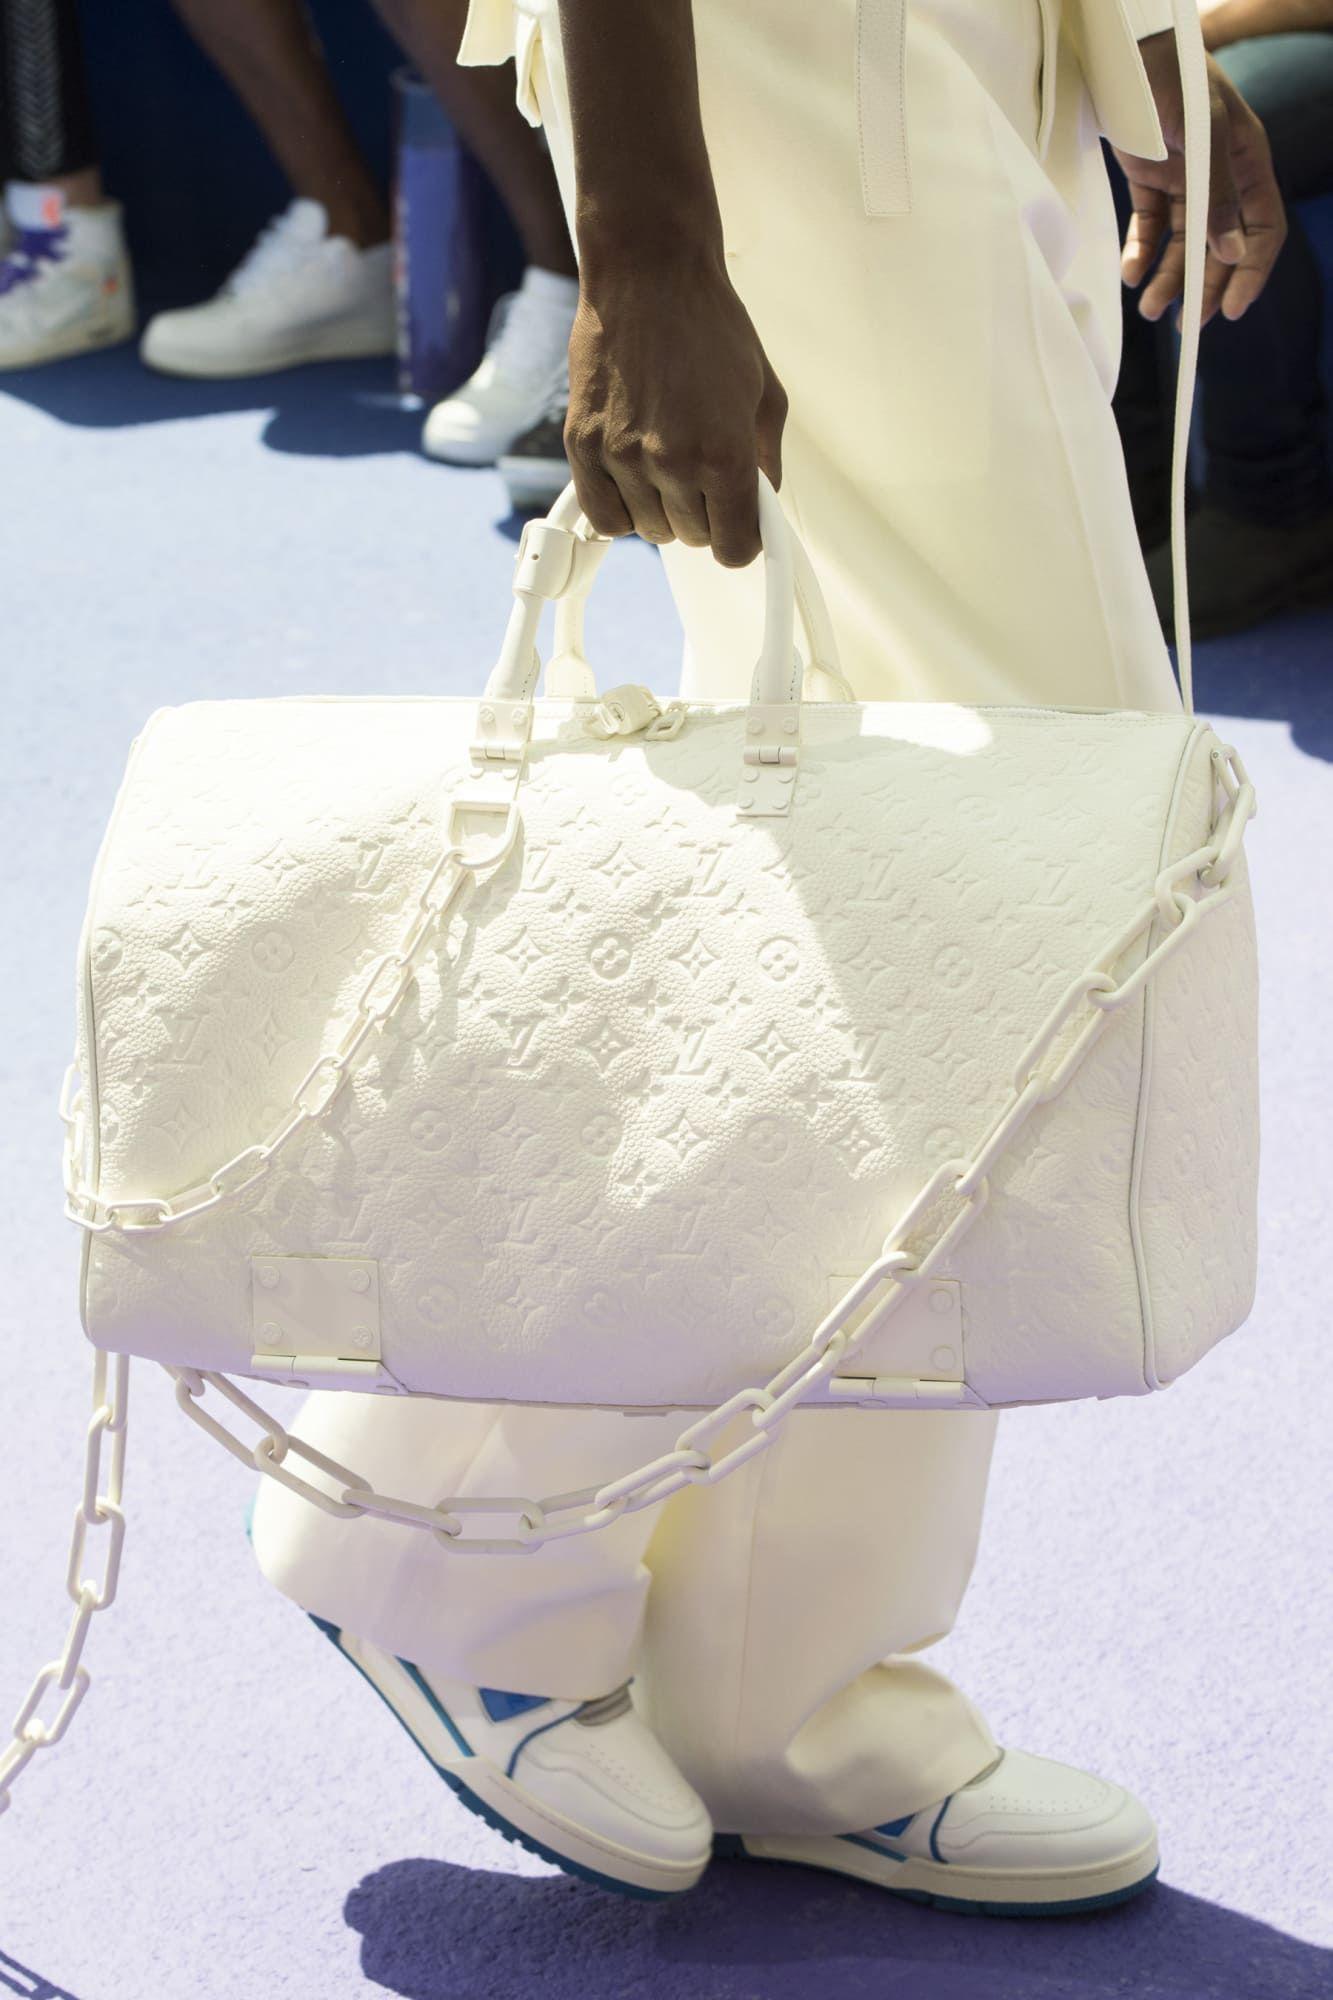 fbc63c5fa44 Louis Vuitton Men s Spring Summer 2019 Sneakers Sunglasses Bags Accessories  - Fashionista